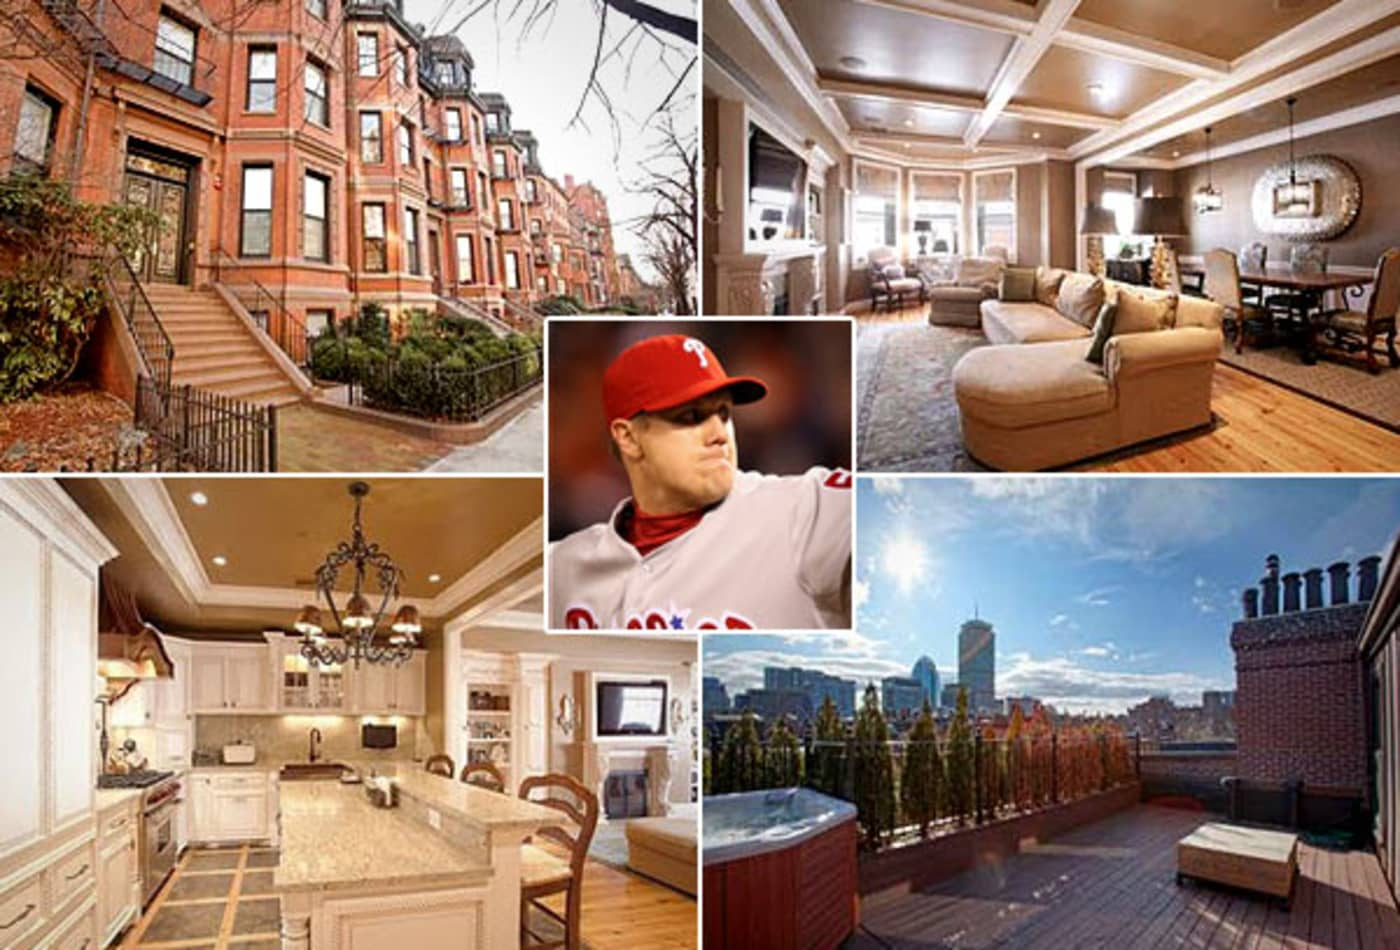 Jonathan-Papelbon-Baseball-Homes-CNBC.jpg